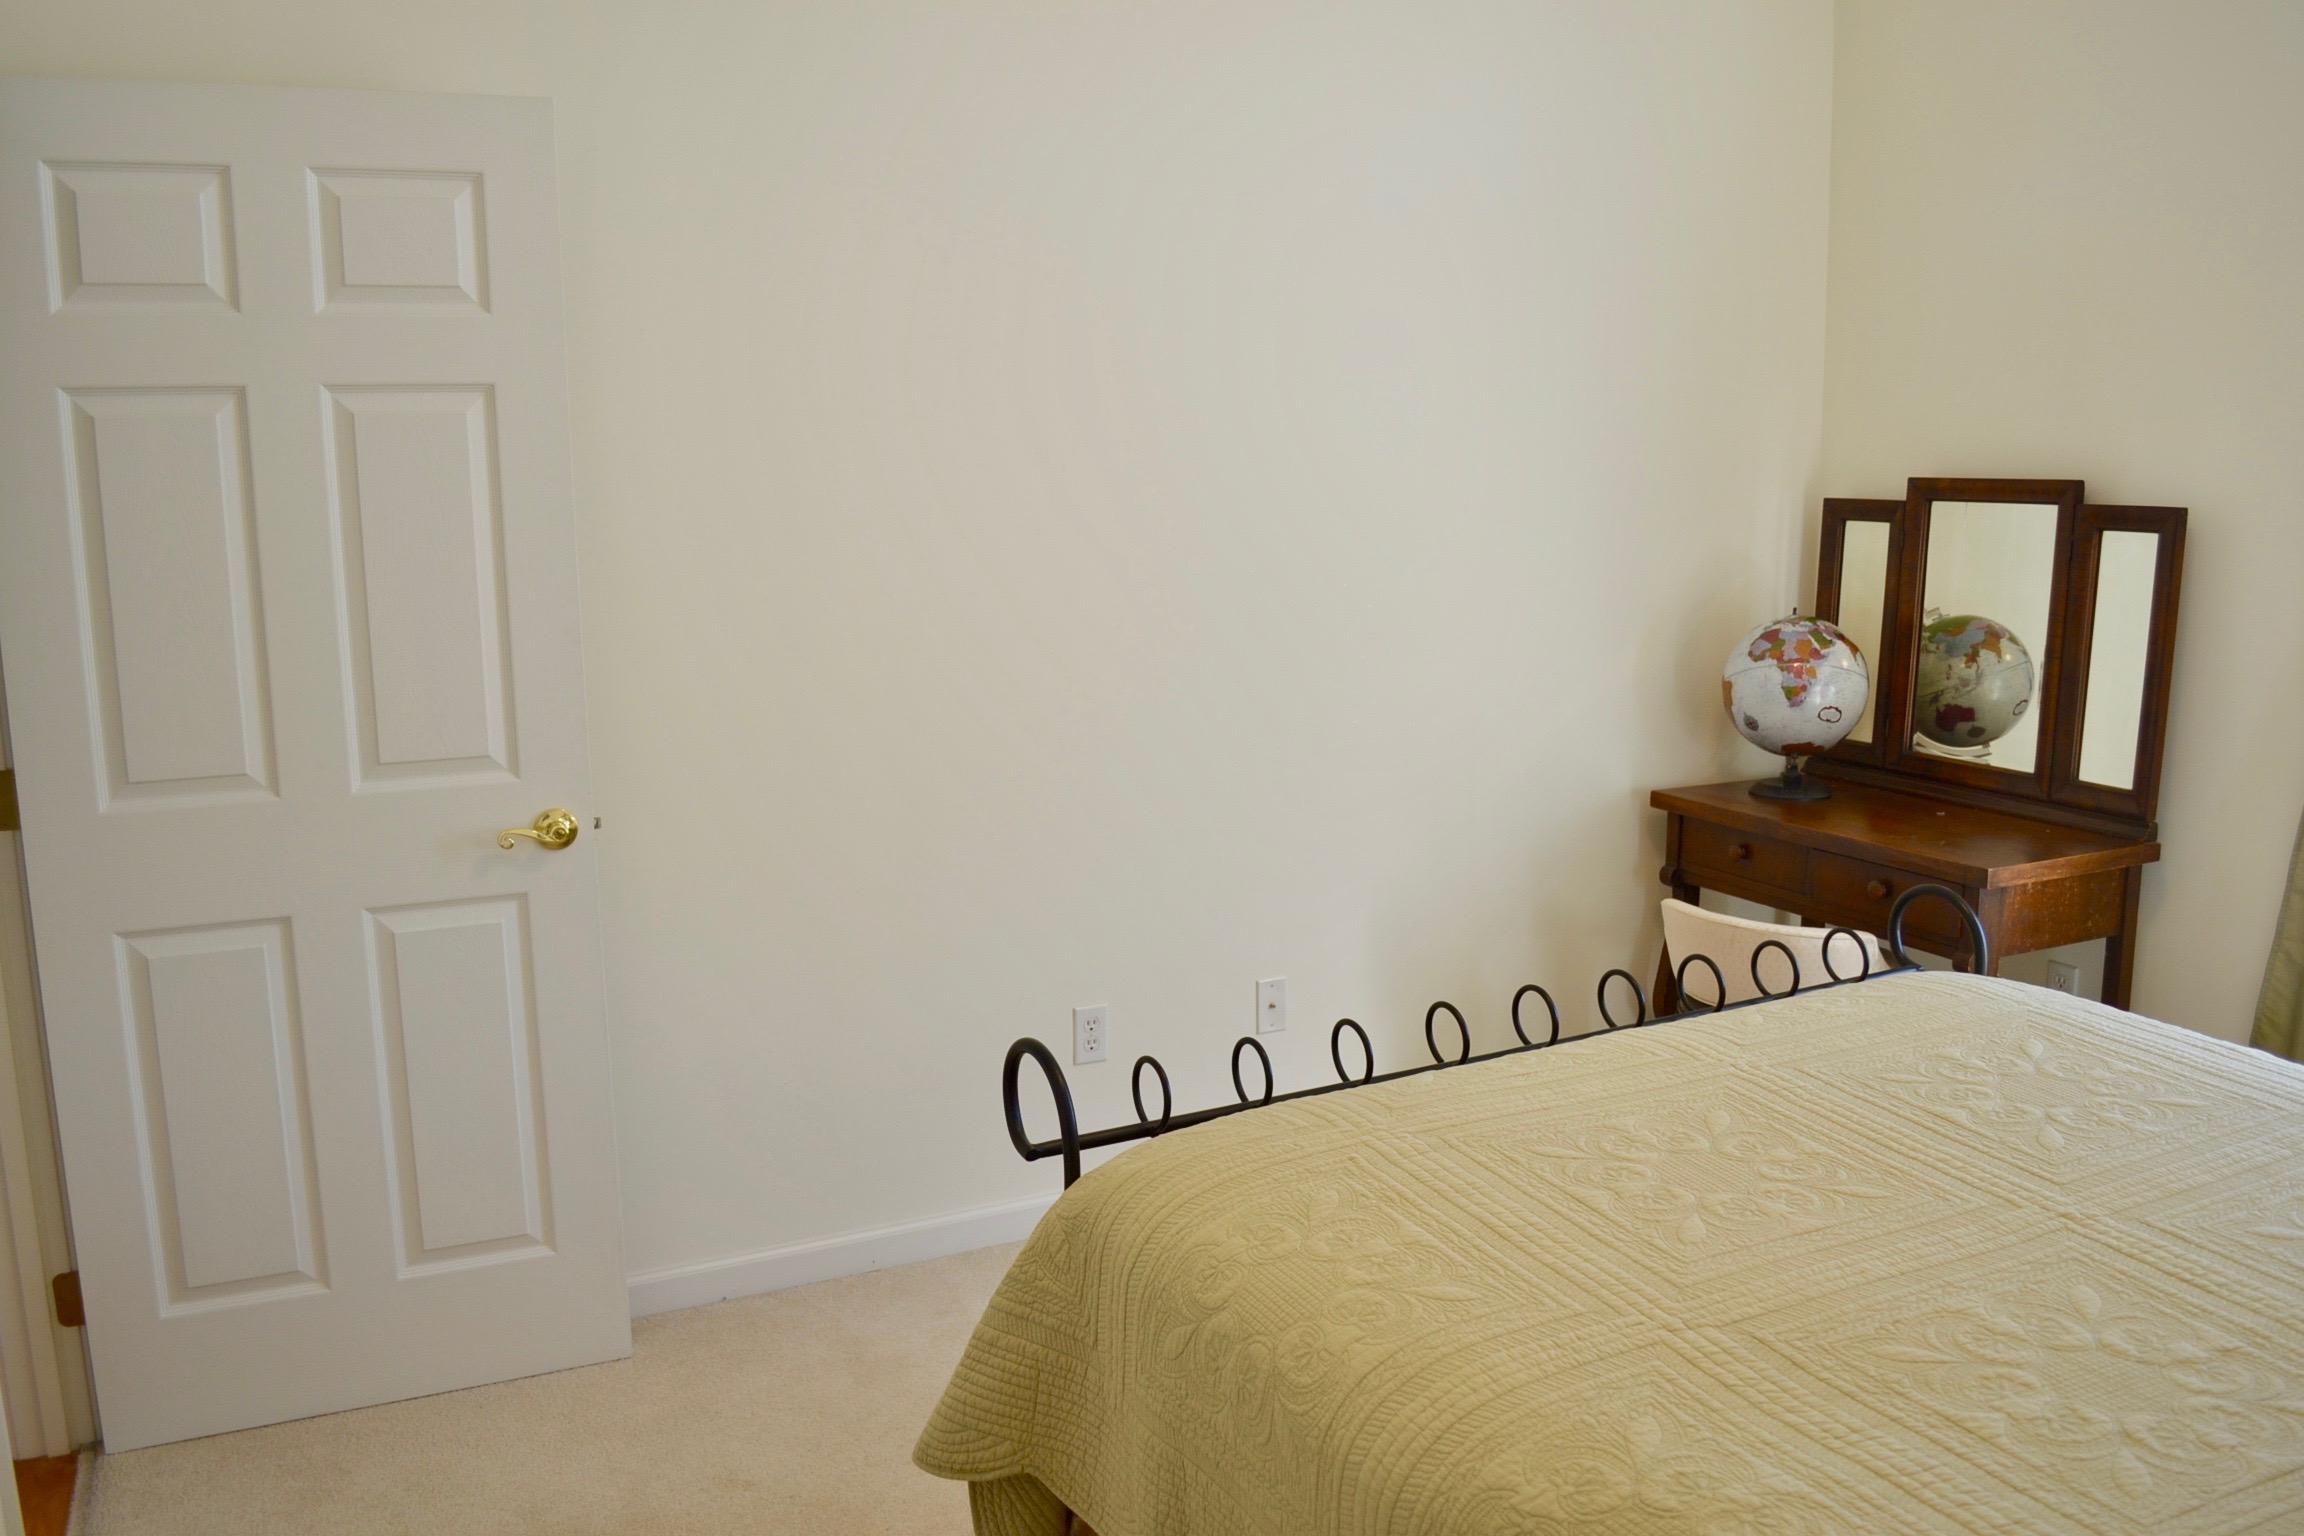 Bedroom 2-6.jpg